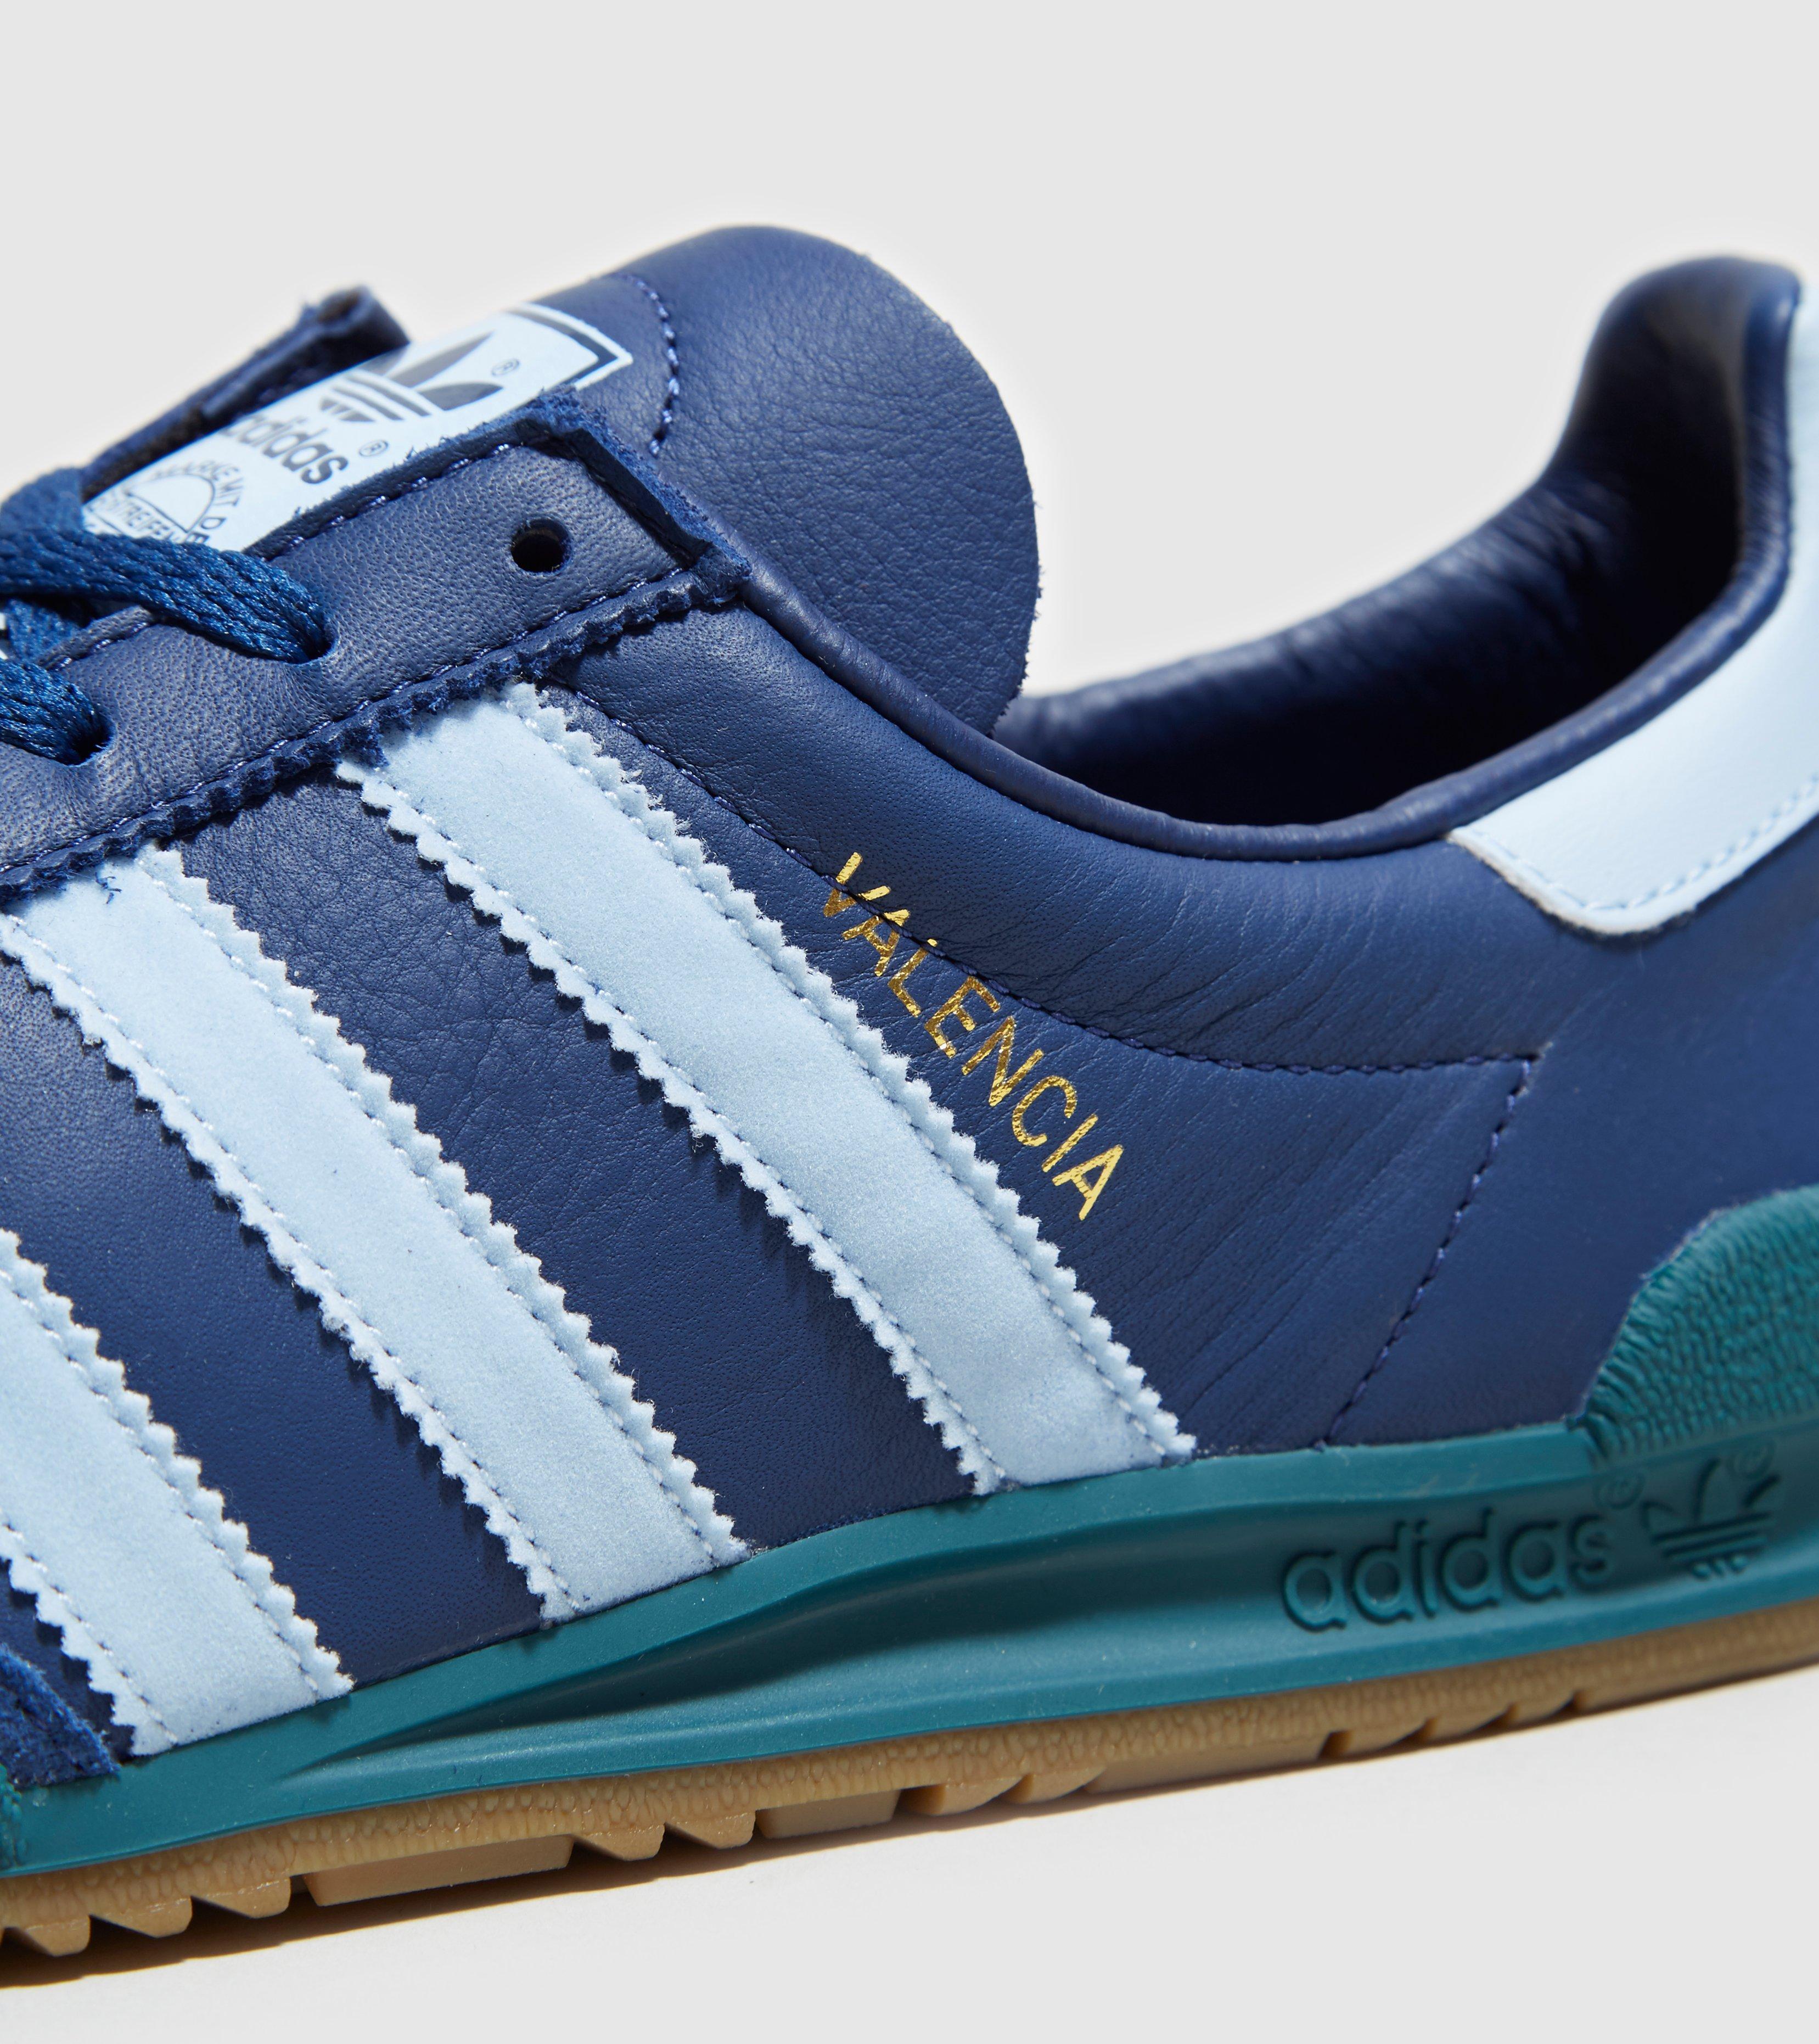 Adidas Originals Valencia In Blue For Men Lyst